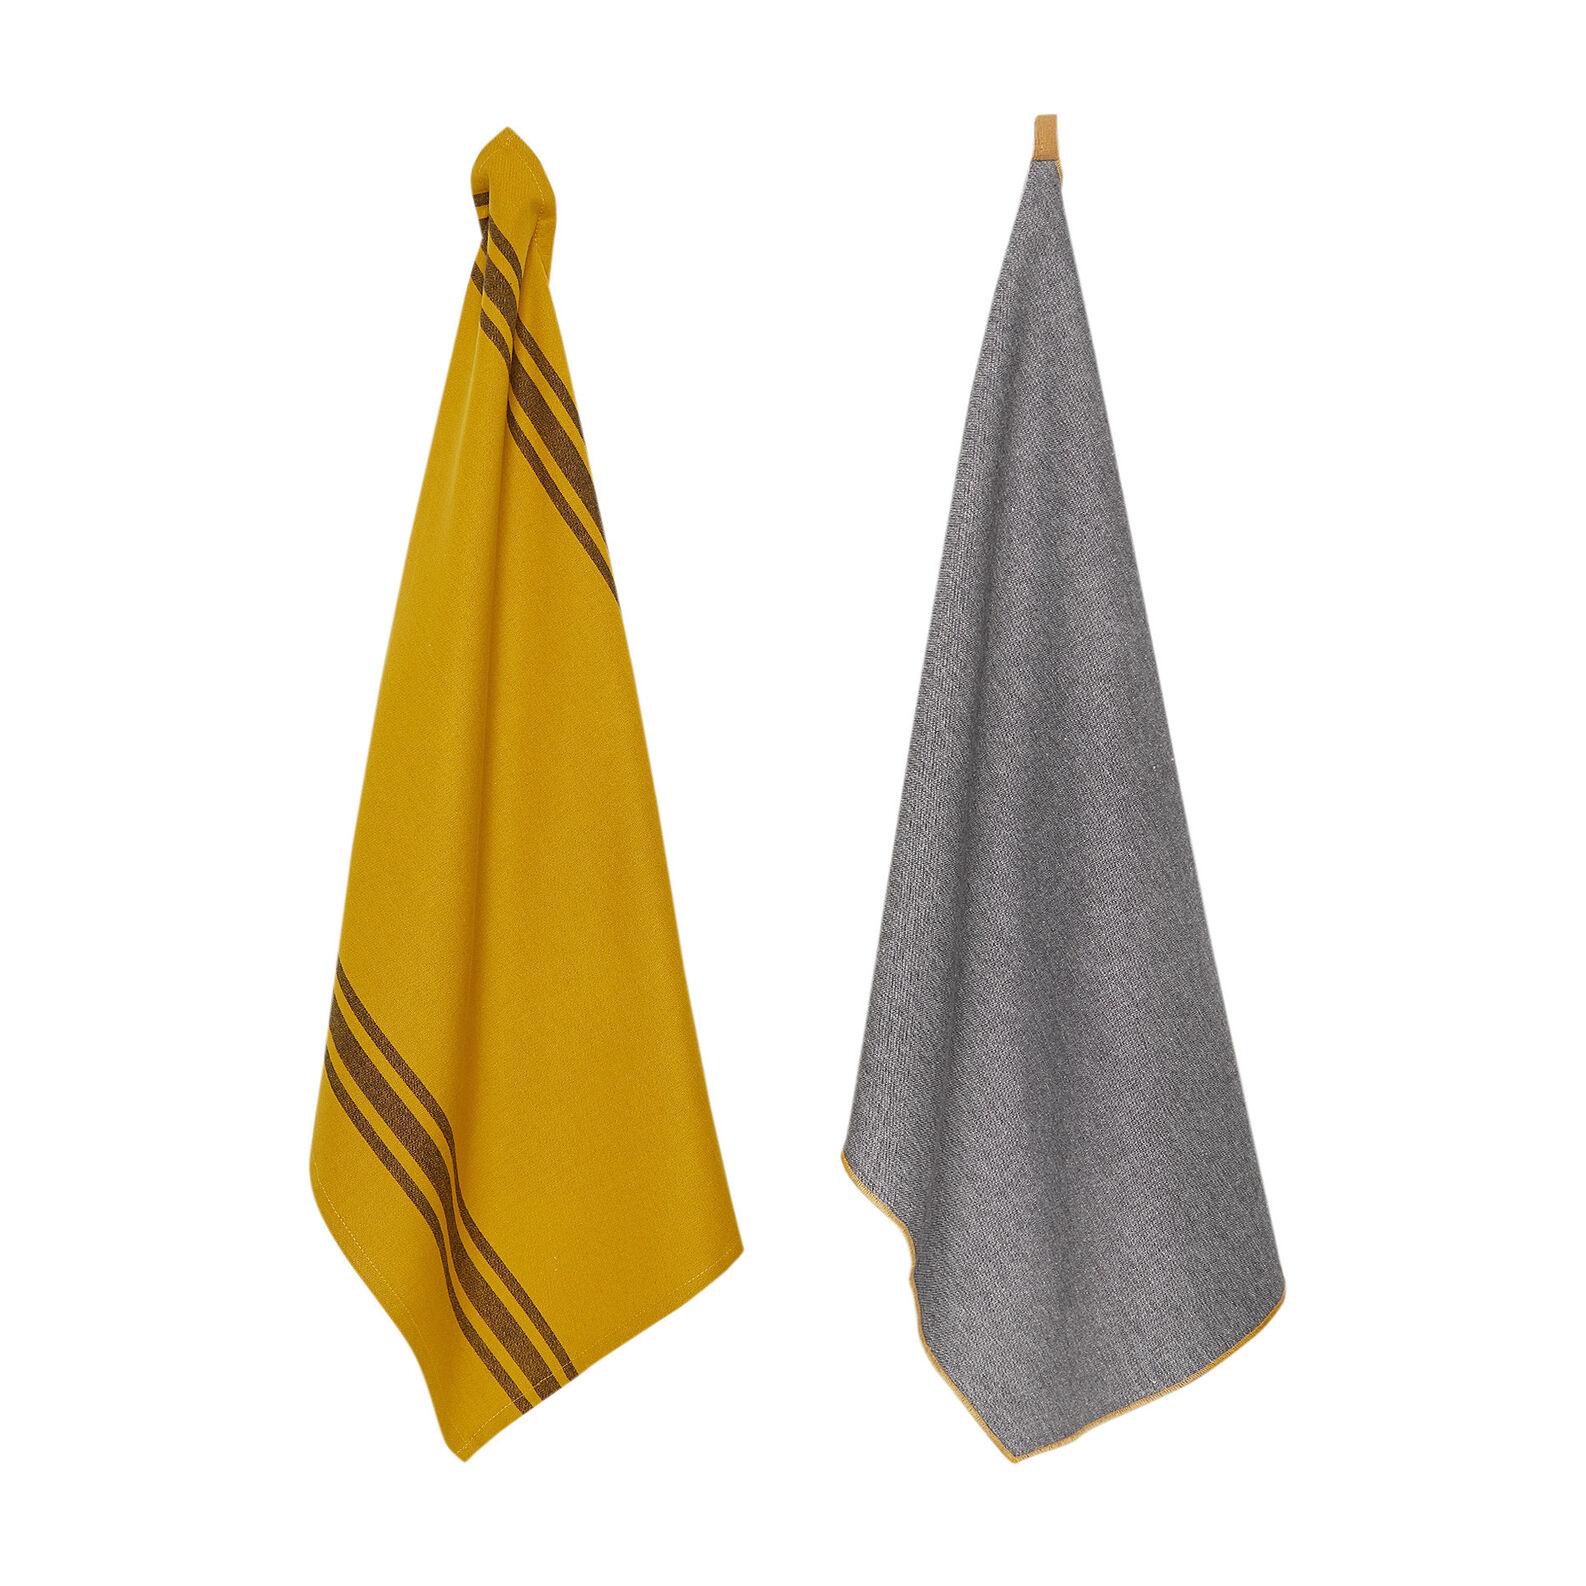 Set of 2 tea towels in 100% cotton